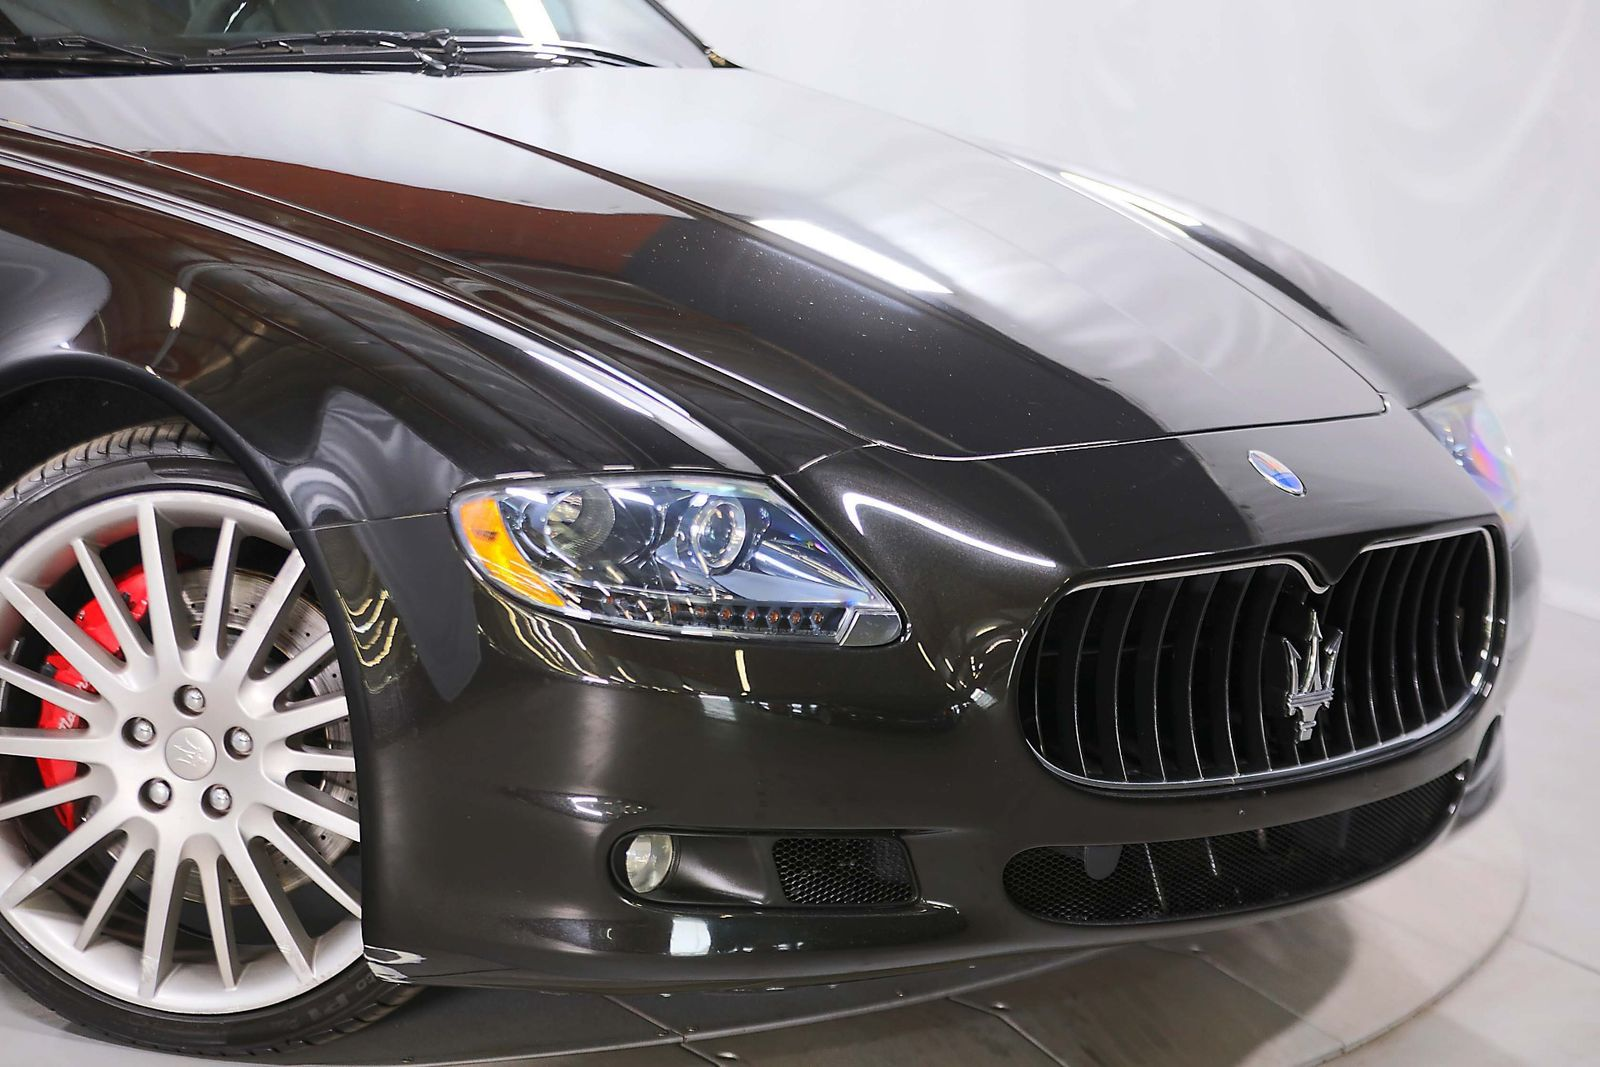 2009 Maserati Quattroporte Sport GT S - CARBON ALCANTARA INTERIOR ...